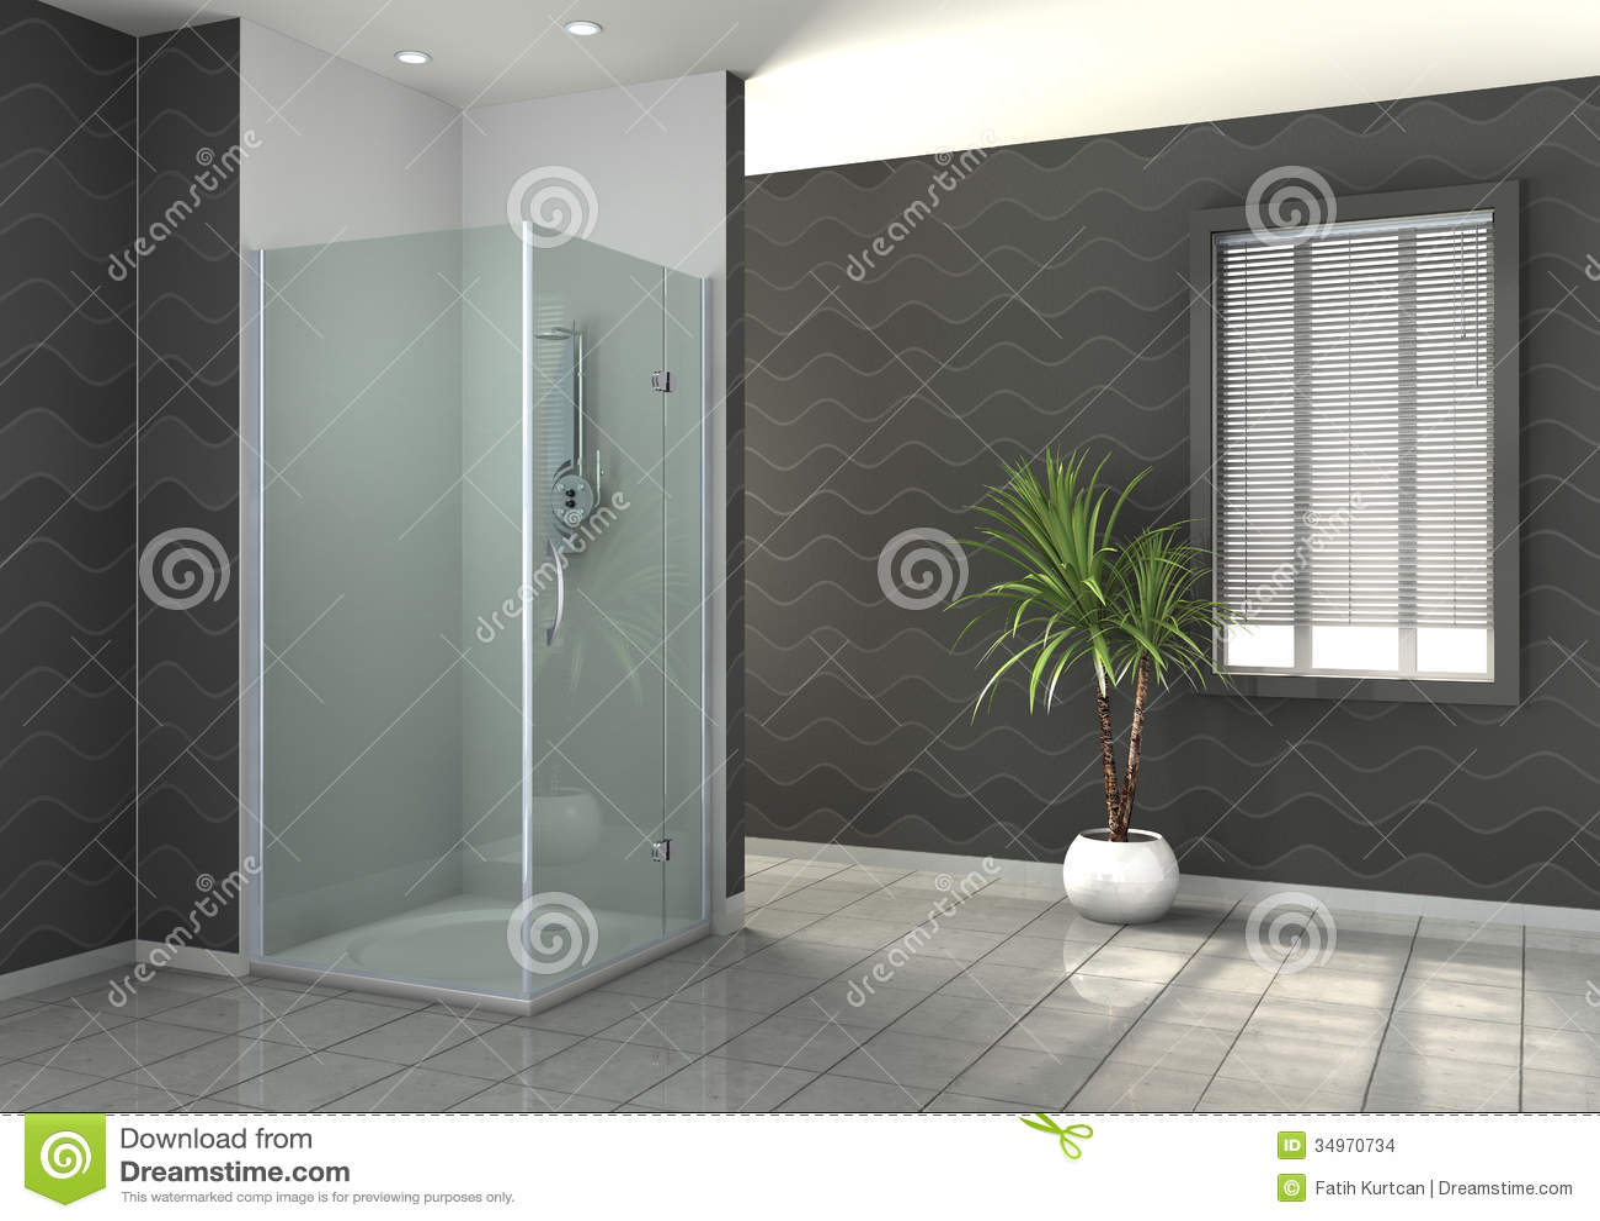 douche de plain pied illustration stock illustration du. Black Bedroom Furniture Sets. Home Design Ideas